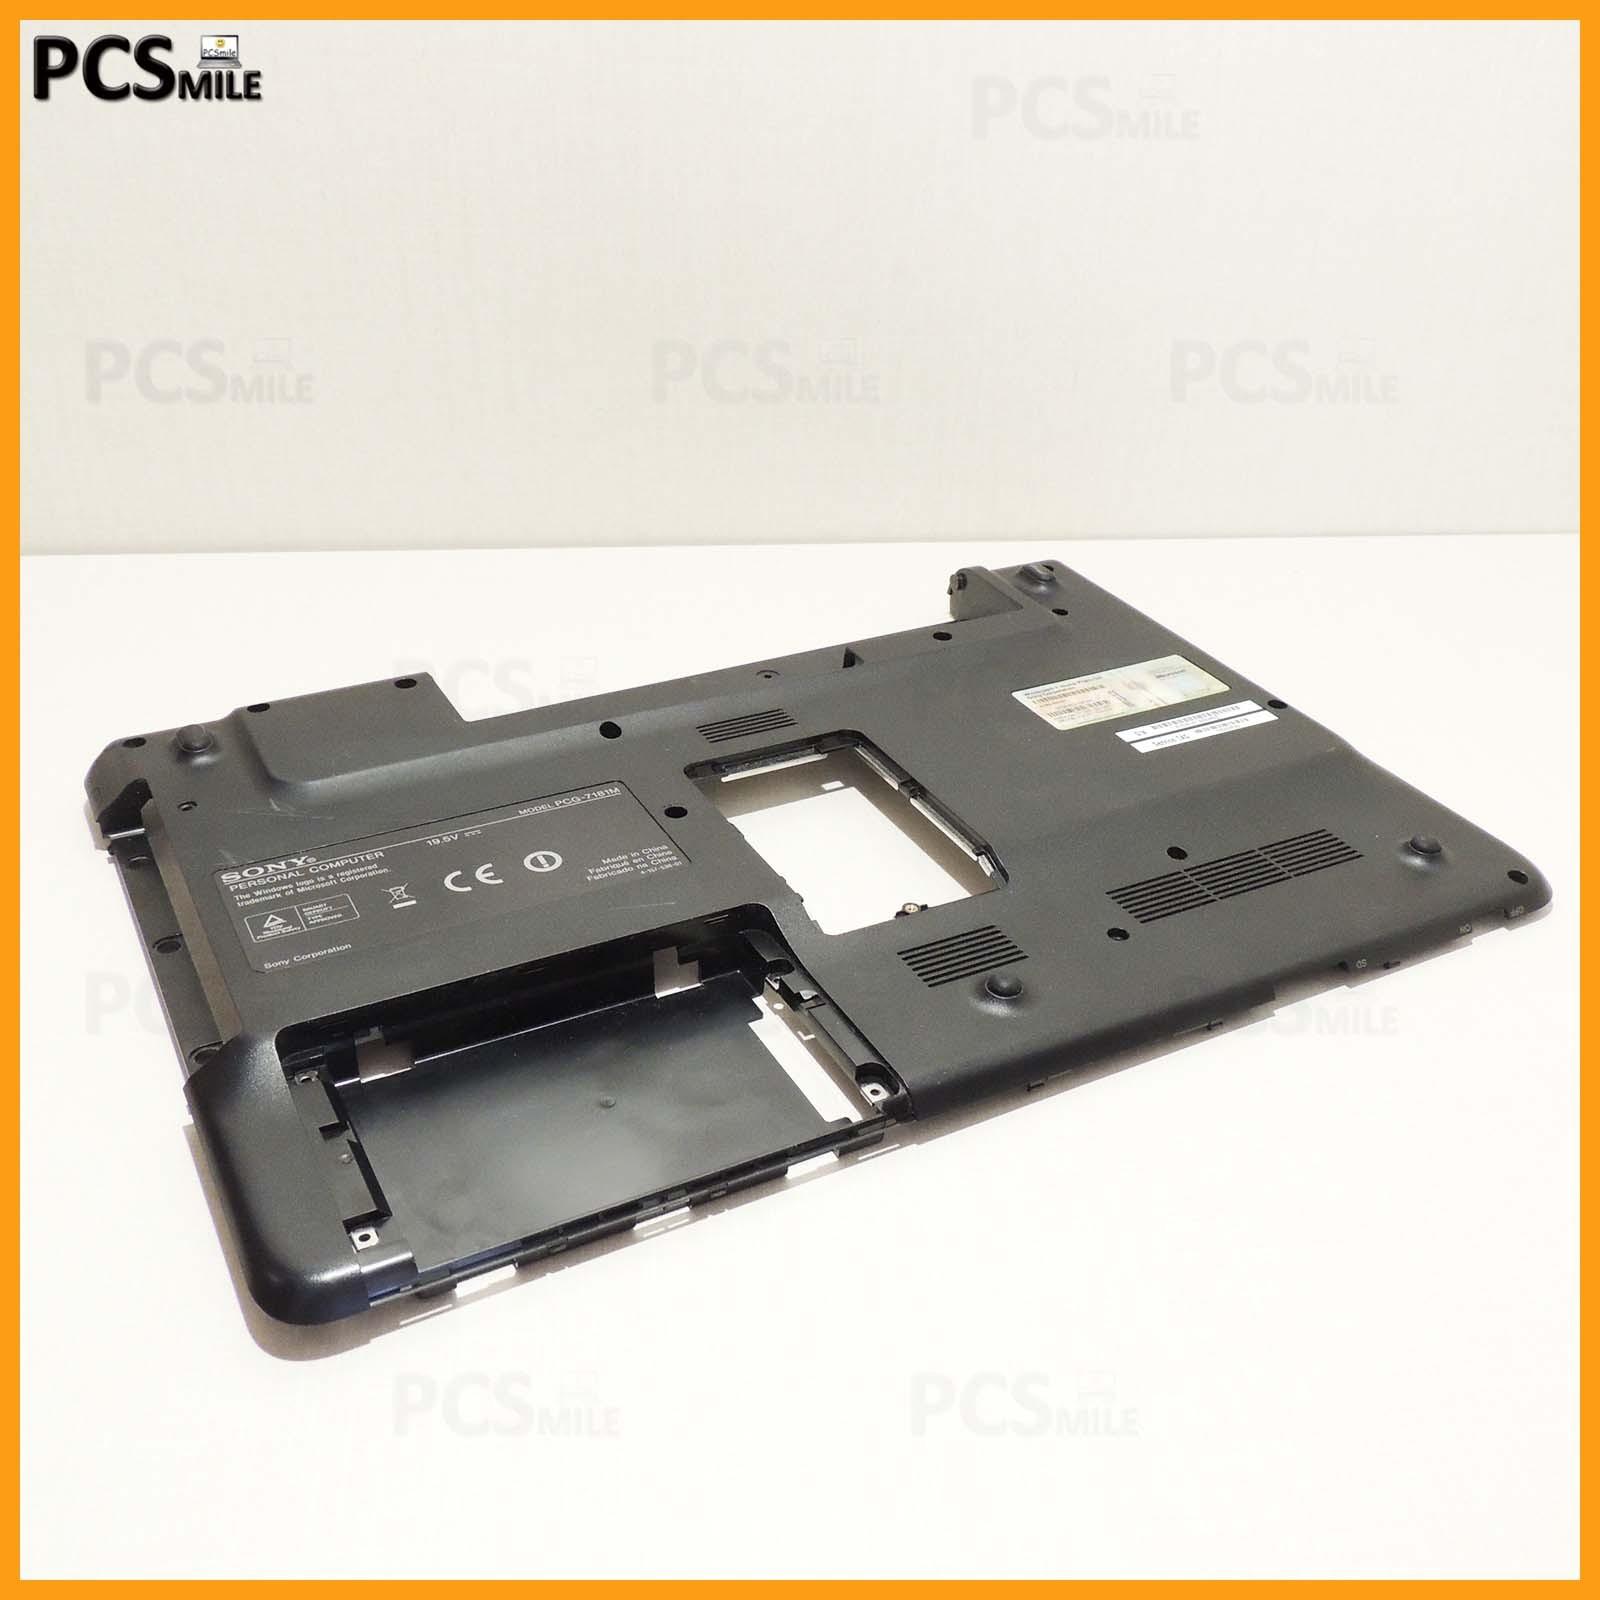 Scocca posteriore Sony Vaio PCG-7181M VGN-NW21ZF P/N: 012-021A-1370-B con sticker originale